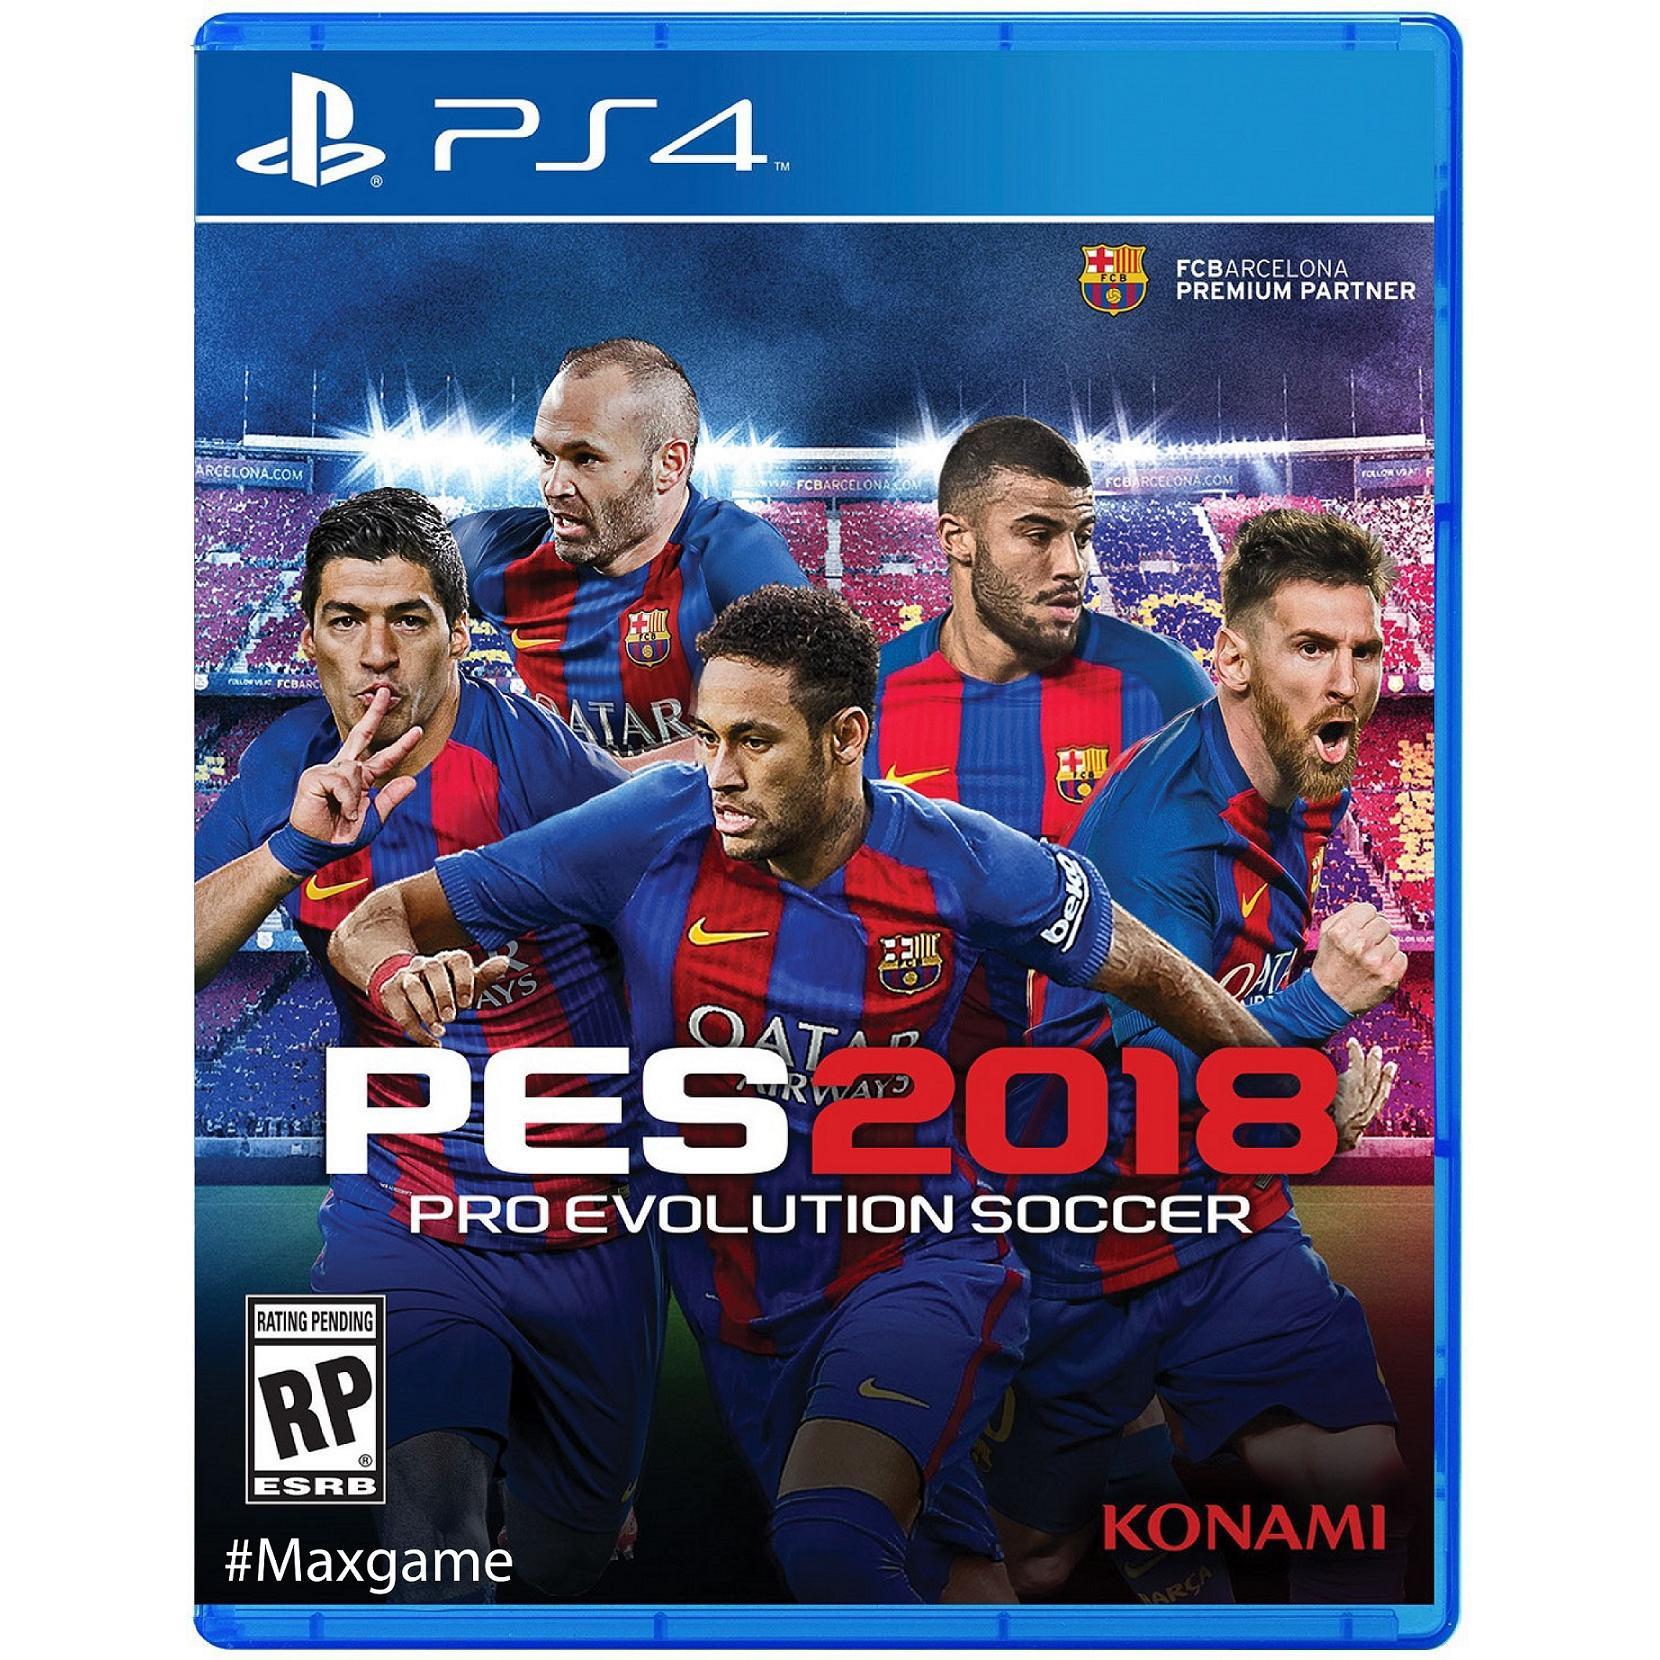 Pro Evolution Soccer 2018 (PES) PS4 £29.99 2nd hand Grainger Games